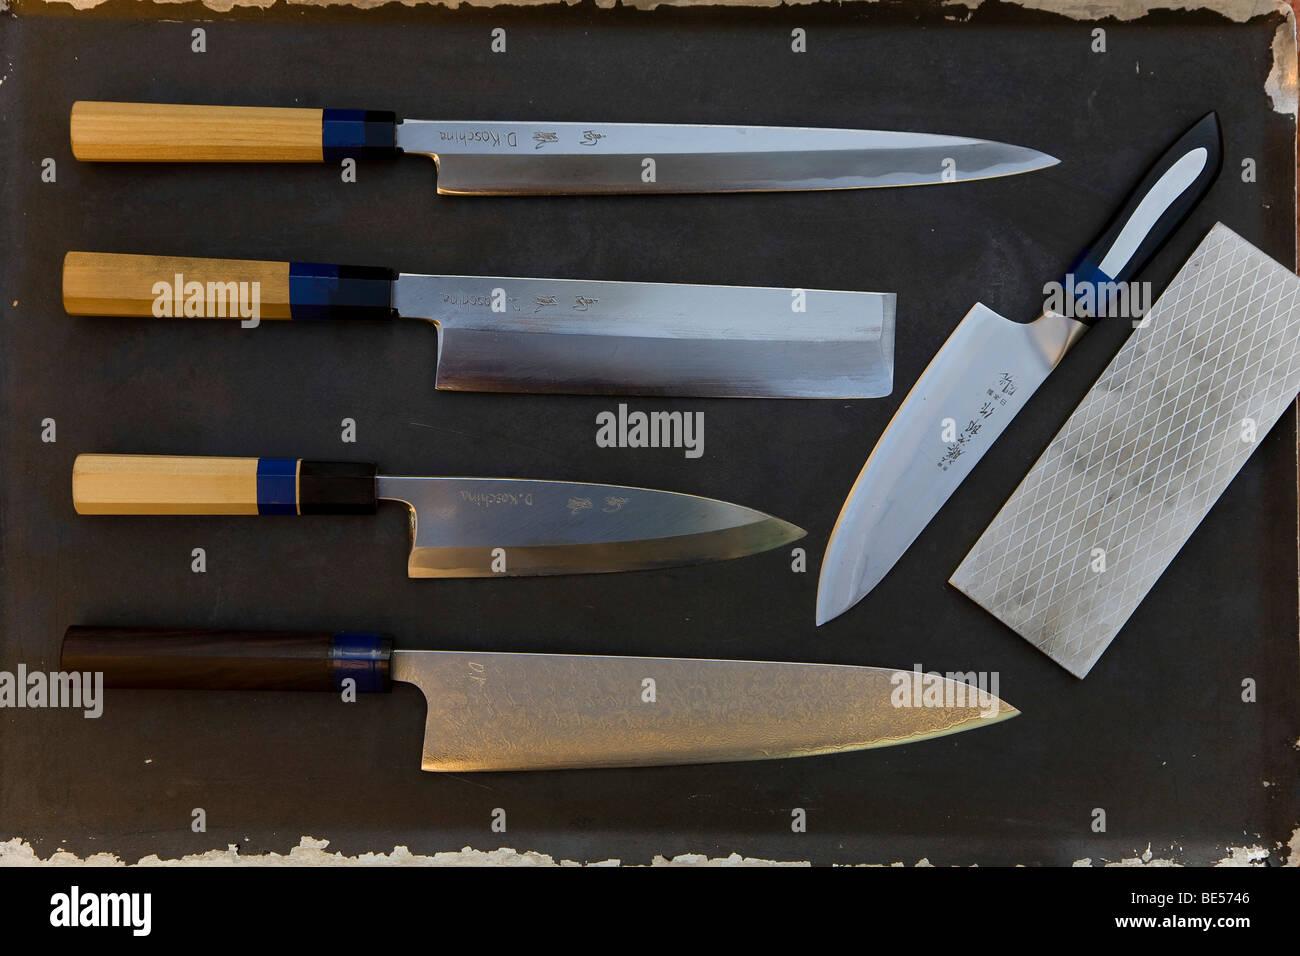 Japanese kitchen knifes belonging to the star chef Dieter Koschina, two Michelin stars, the Hotel Vila Joya, Praia - Stock Image